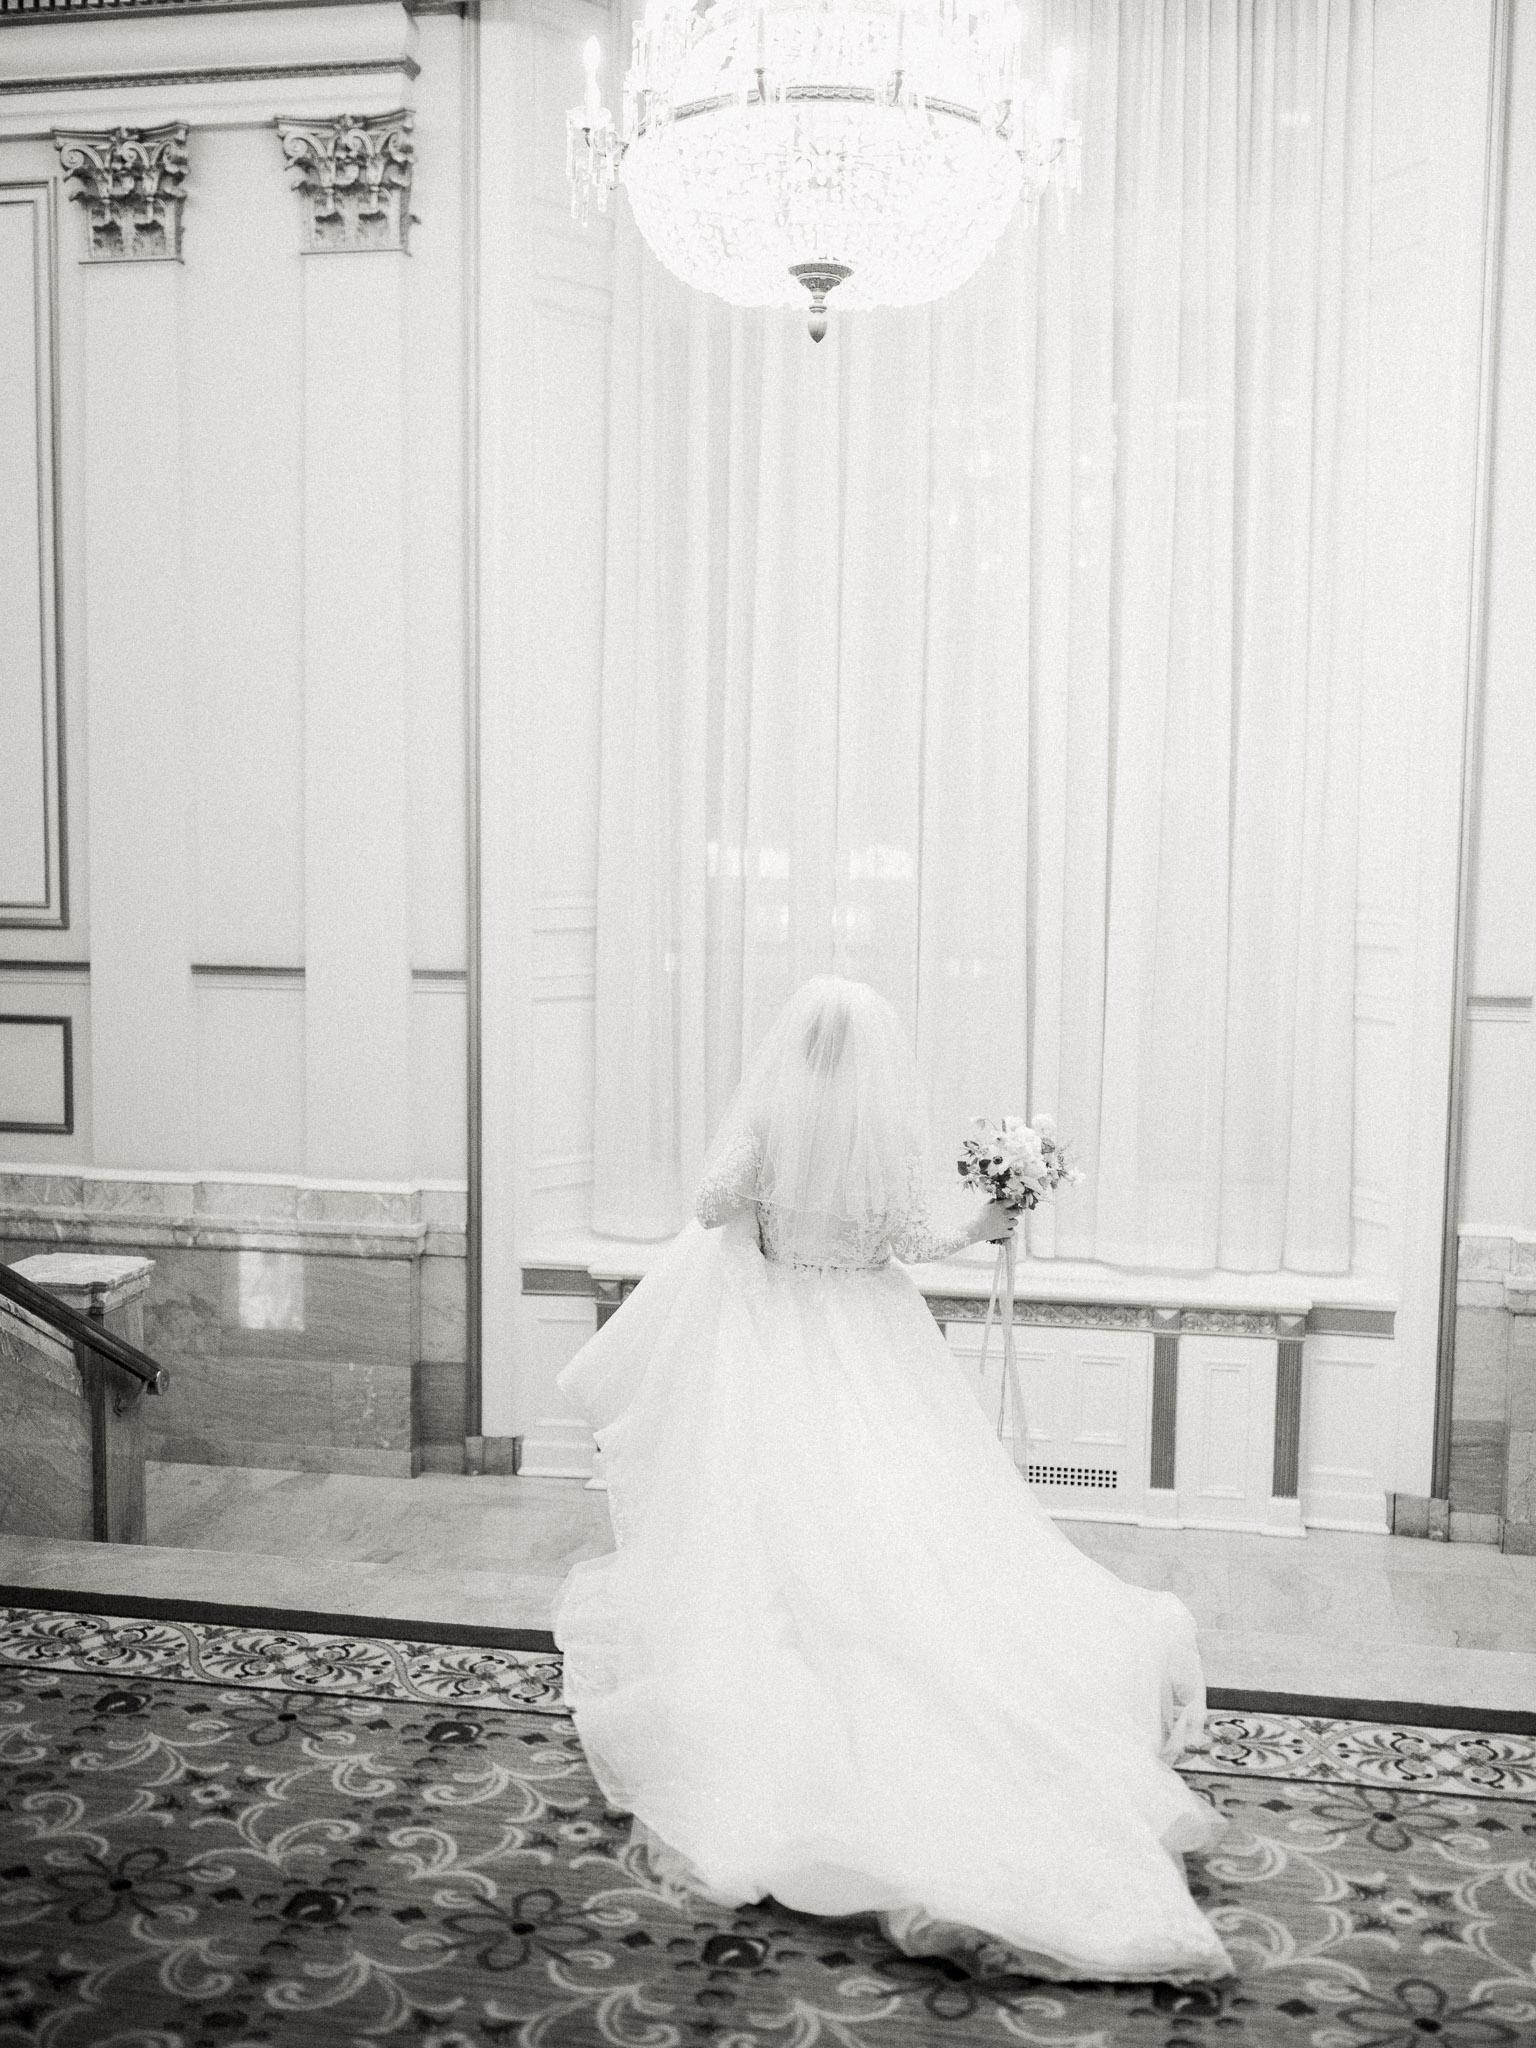 Hanna&Jordan Wedding_HotelVancouver_9427.jpg